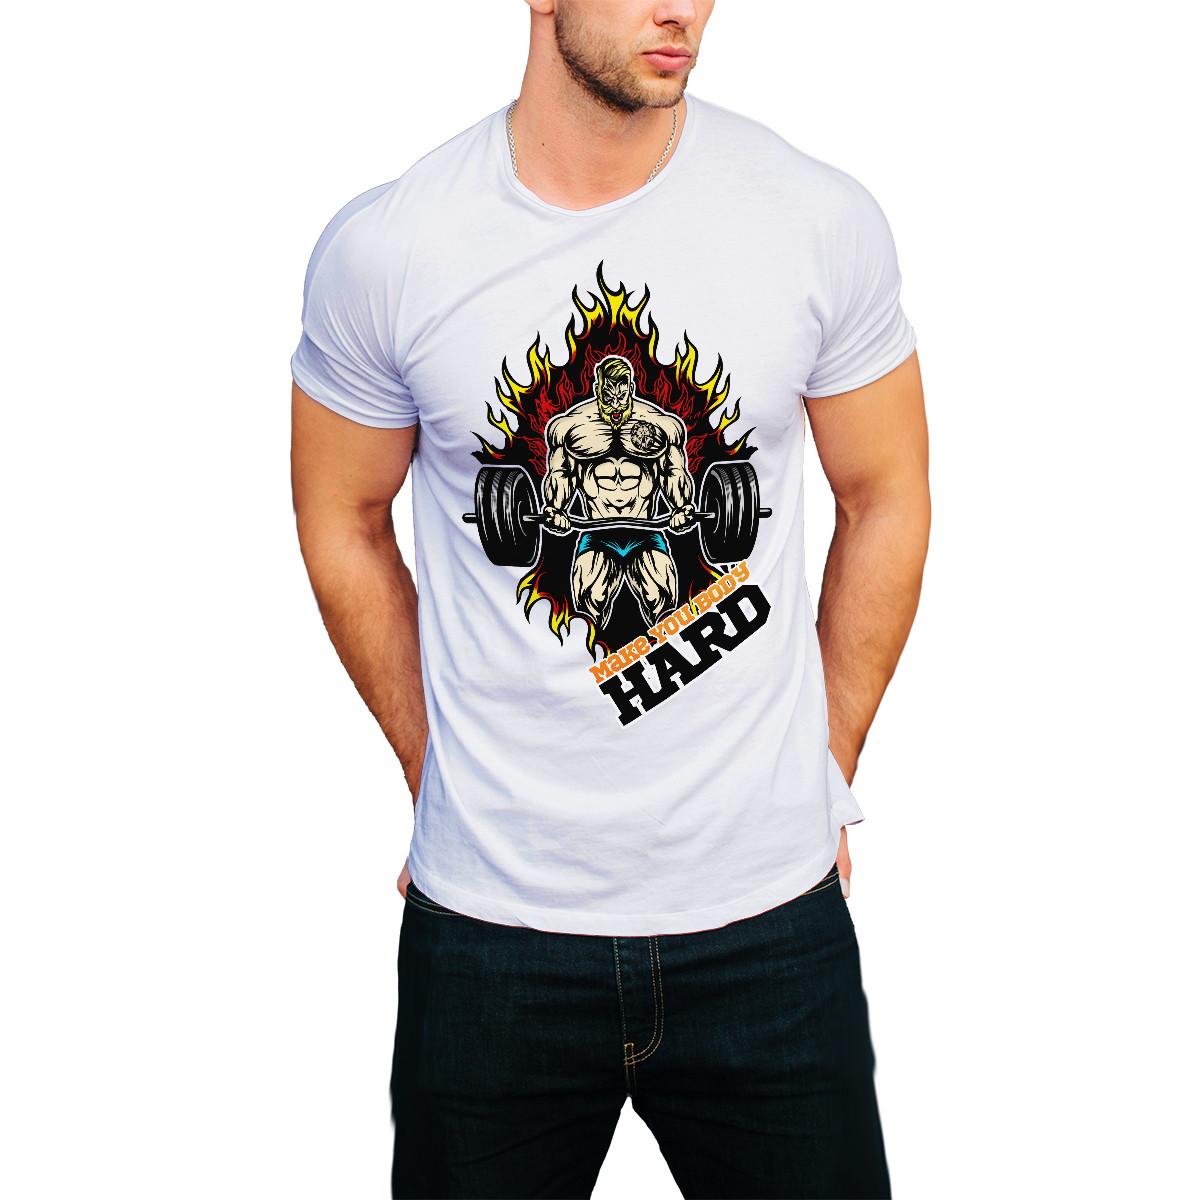 Camiseta Nfl Futebol Americano Patriots Camisa Homem Barato  1467d42b01467